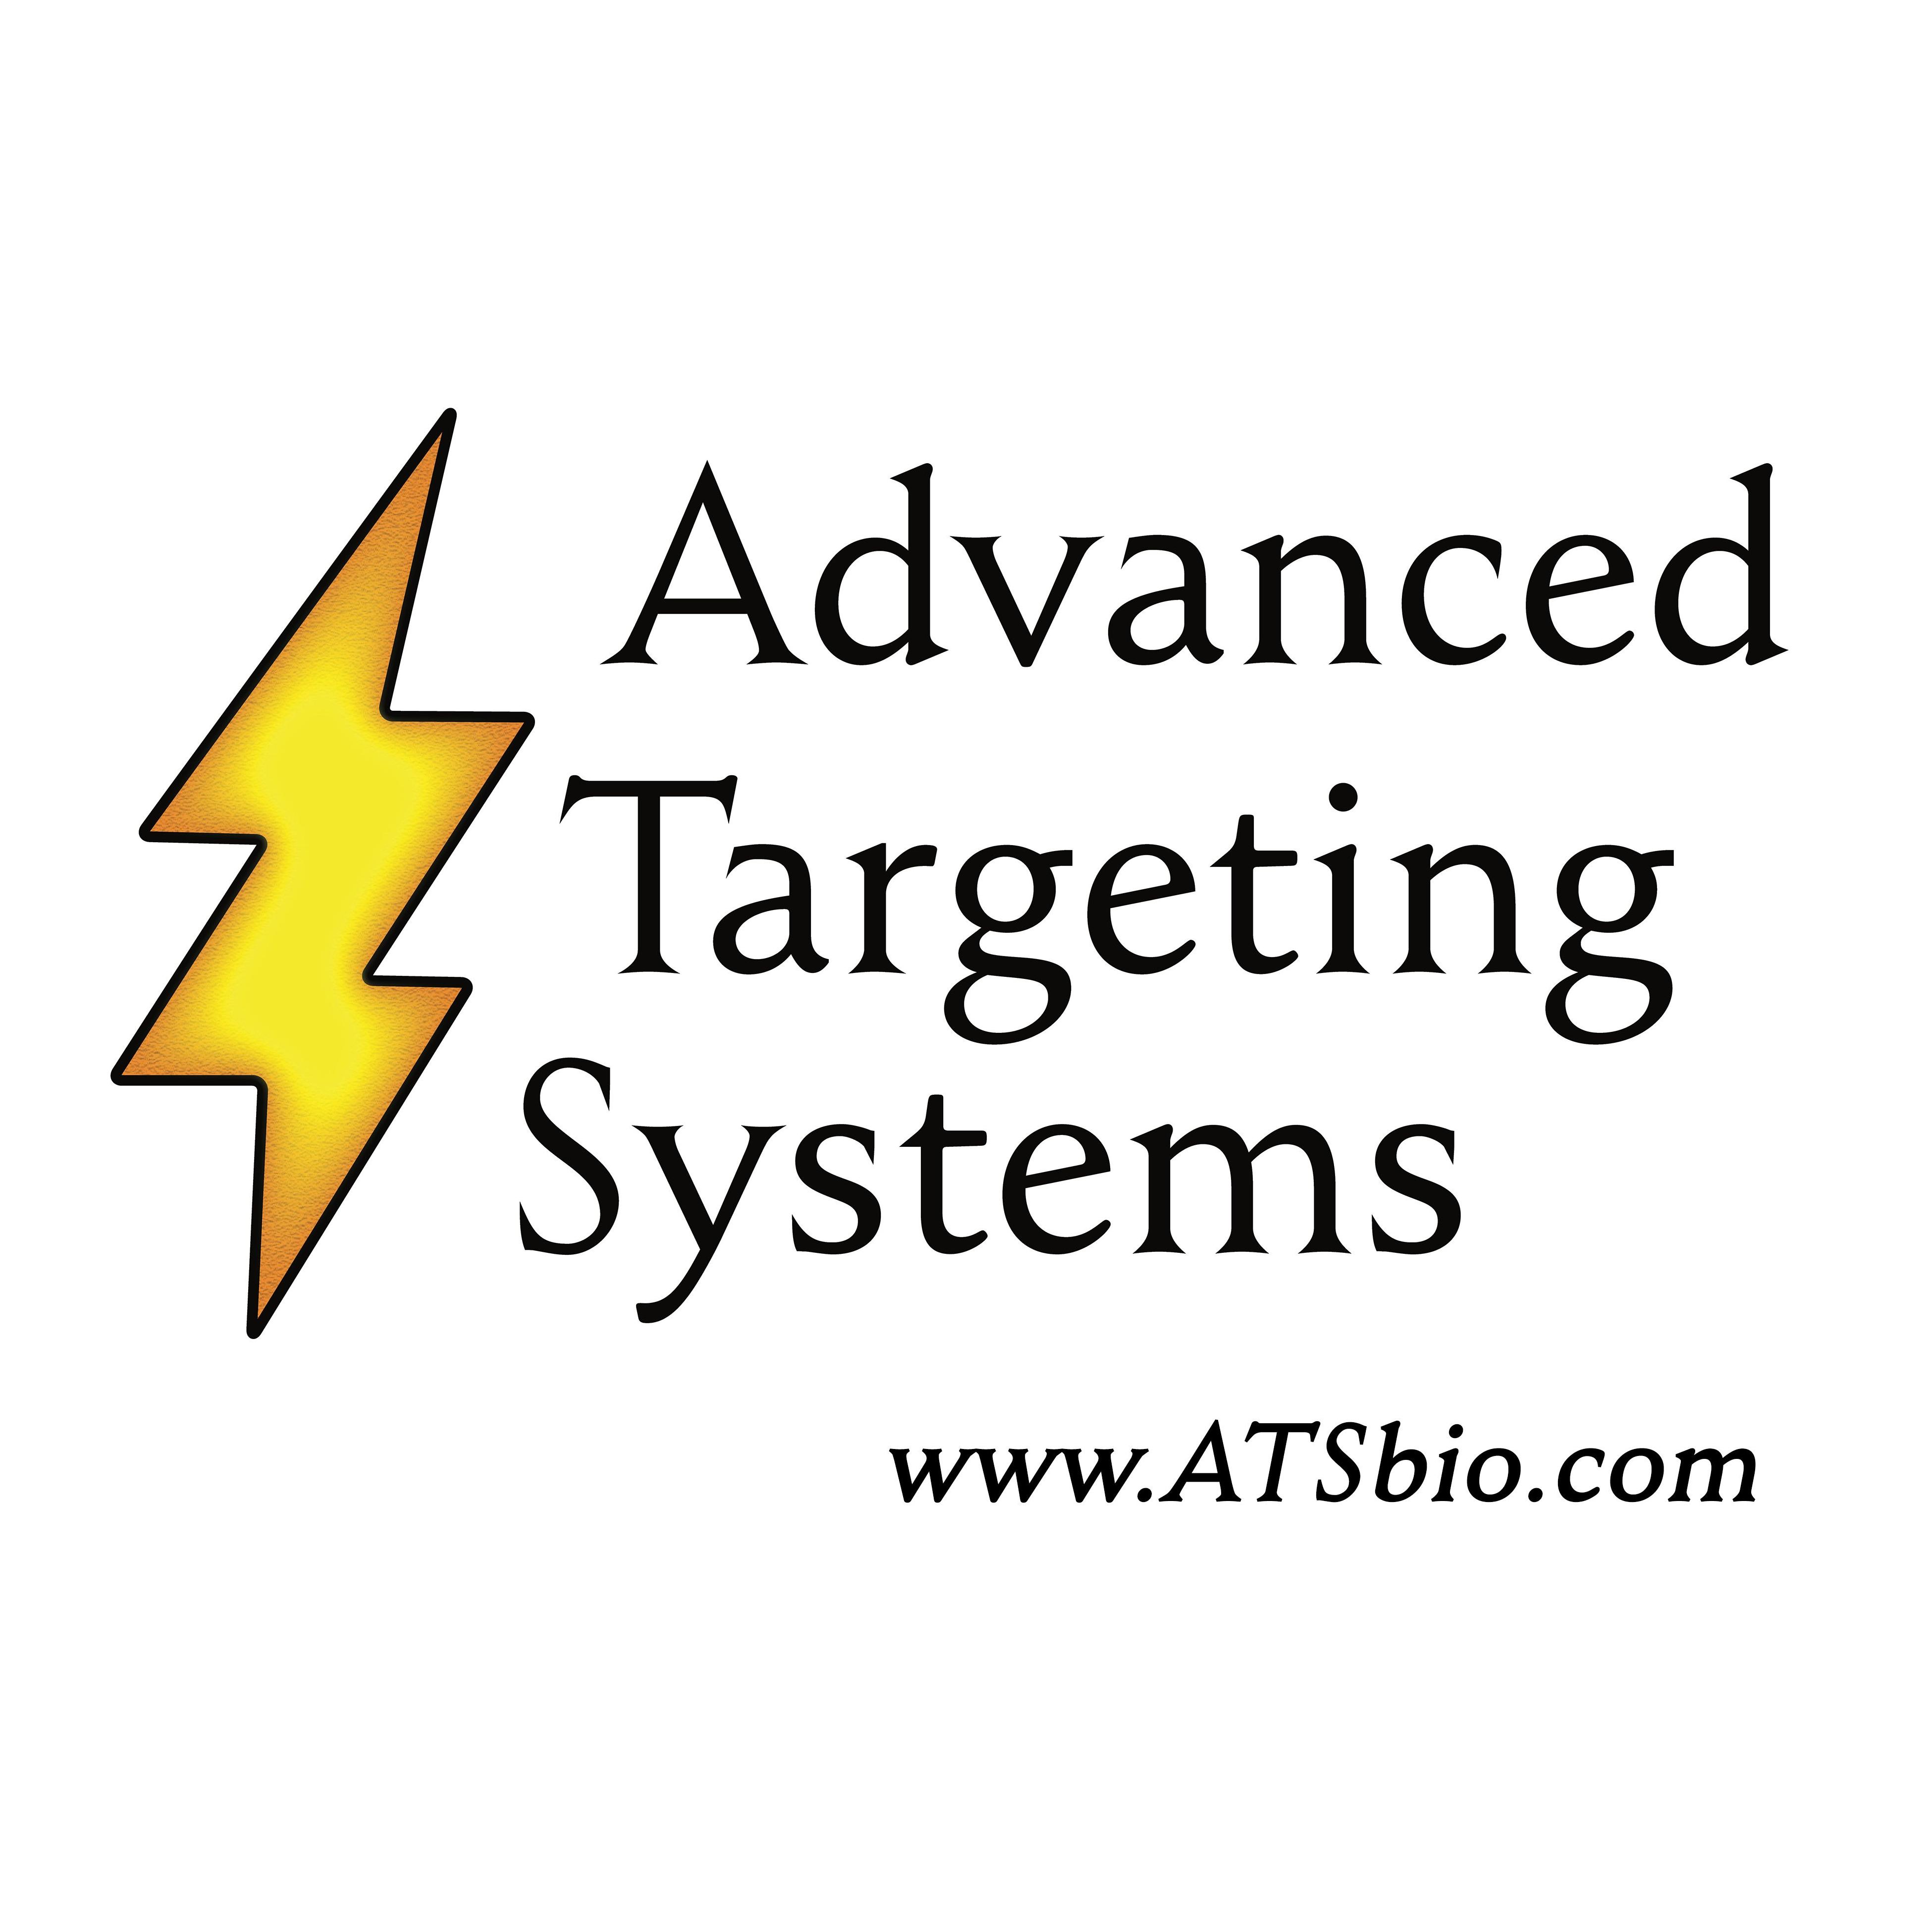 Advanced Targeting System Inc.